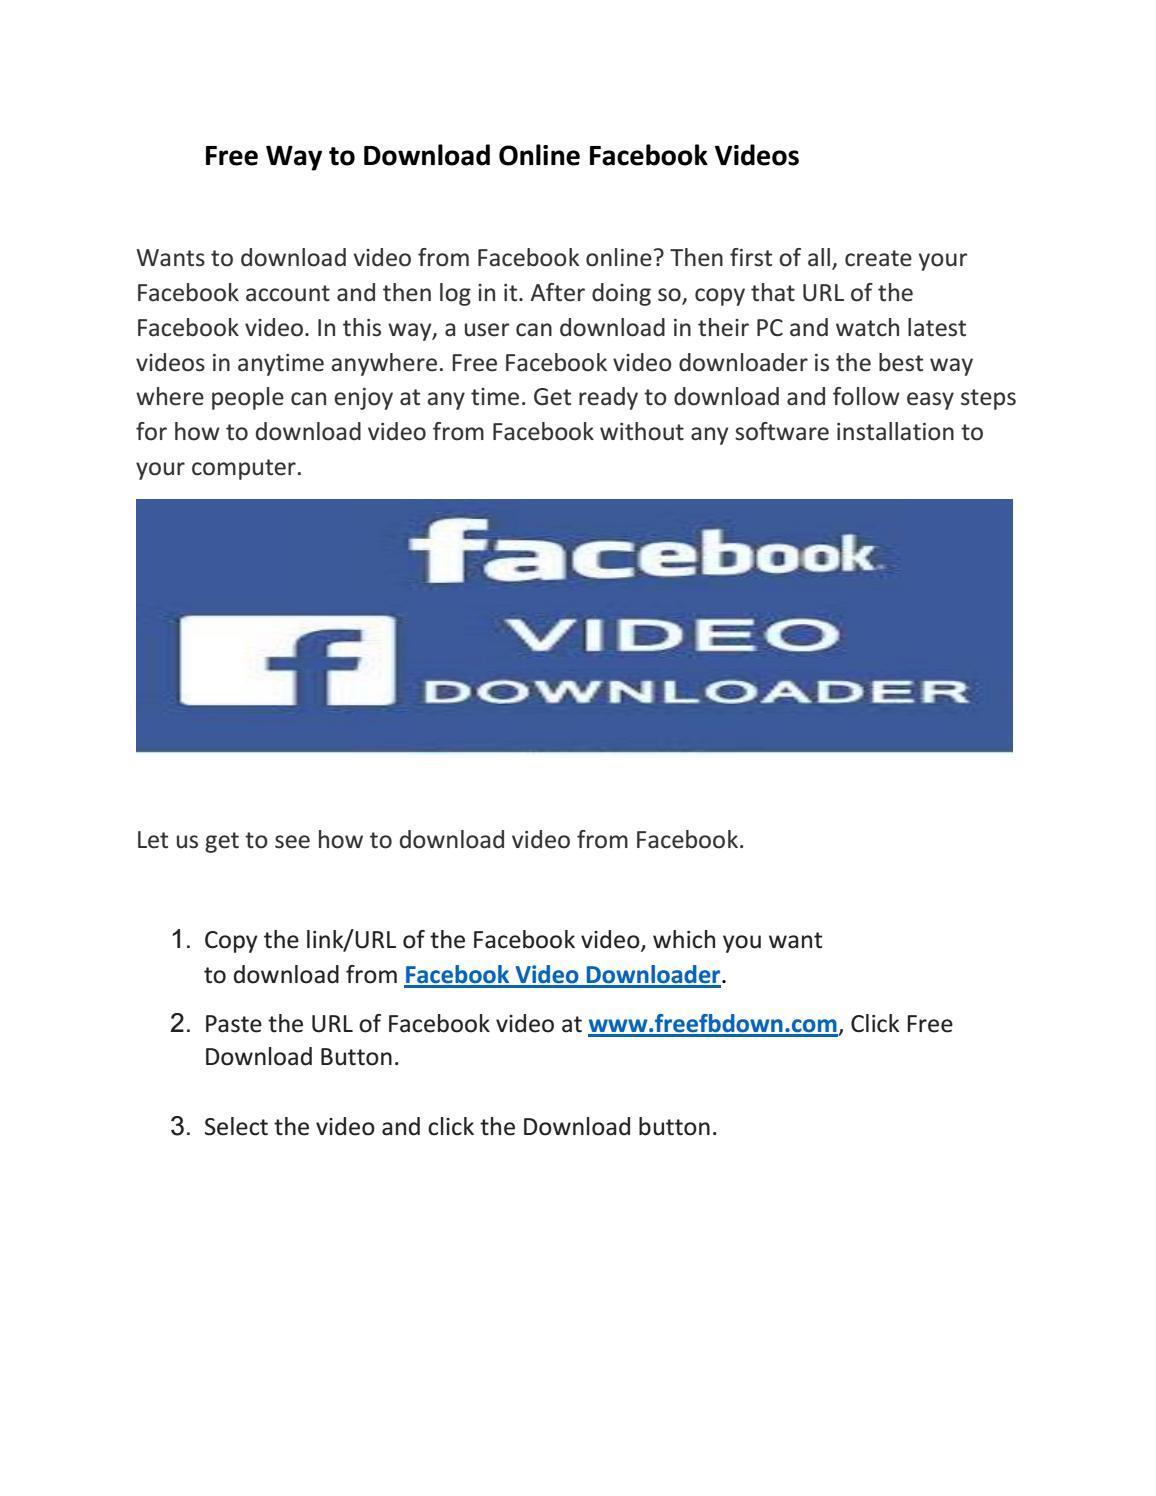 Free Way to Download Online Facebook Videos by Facebook